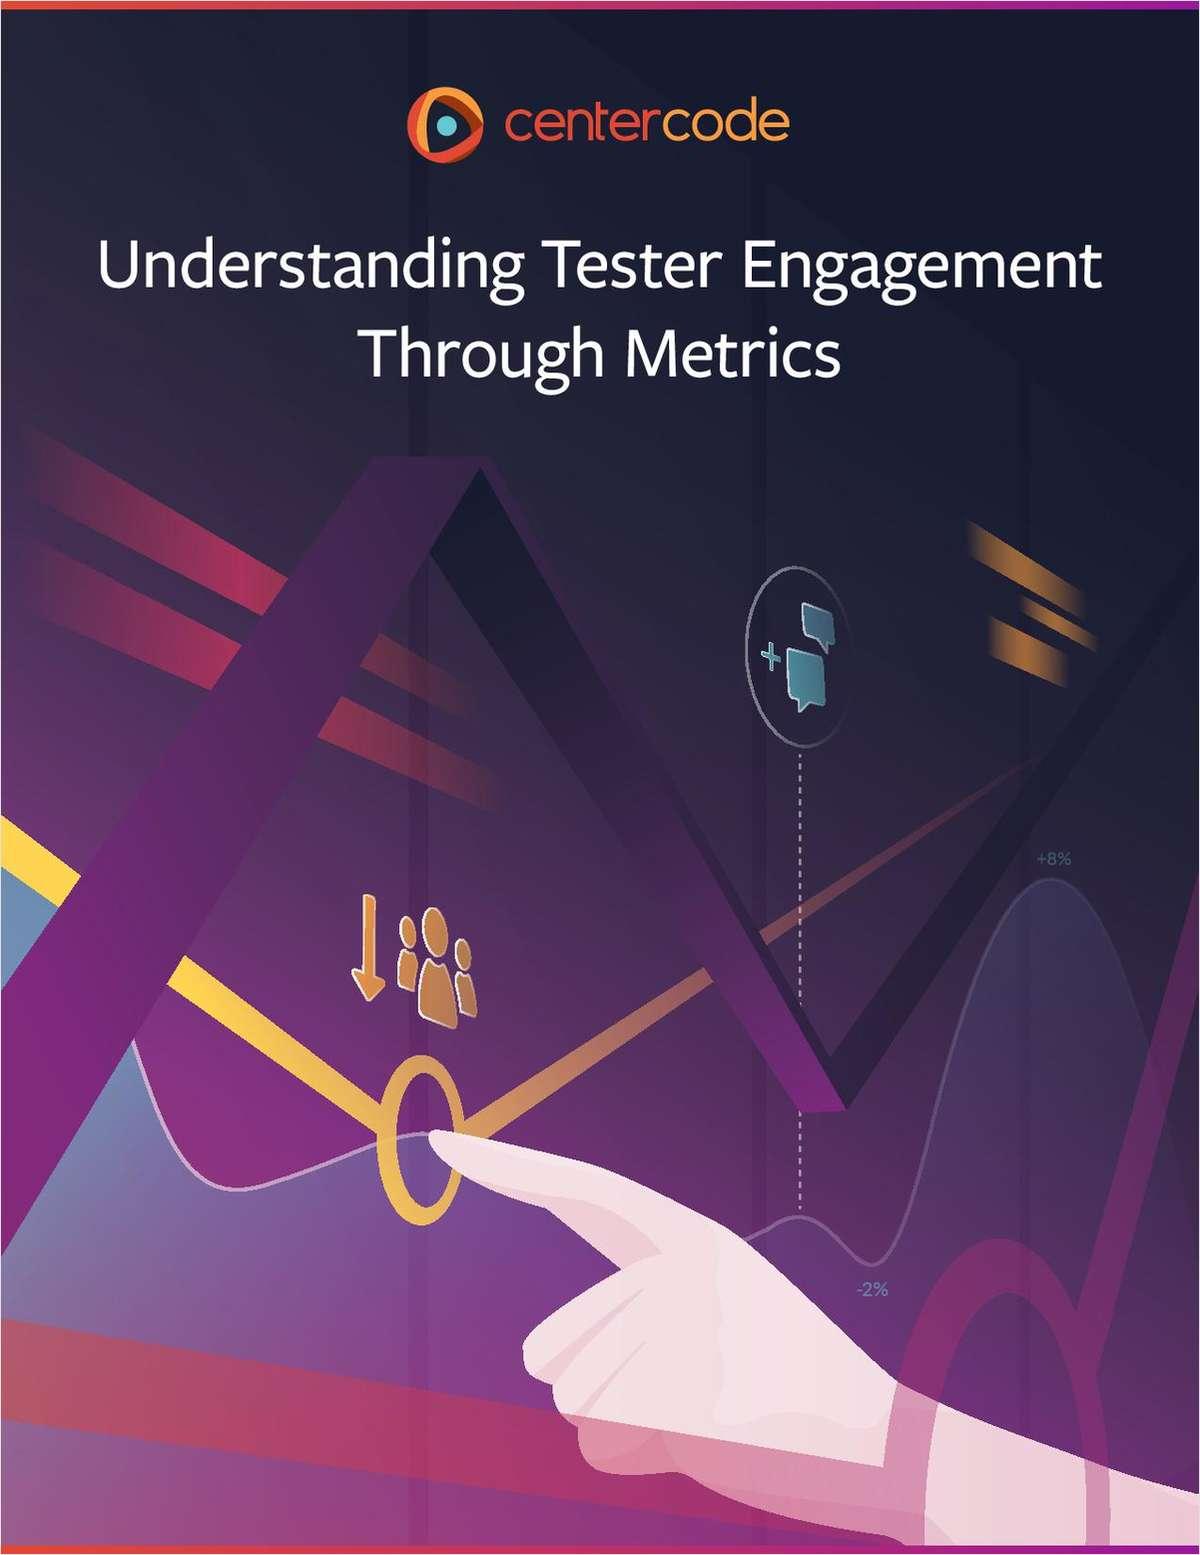 Understanding Tester Engagement Through Metrics